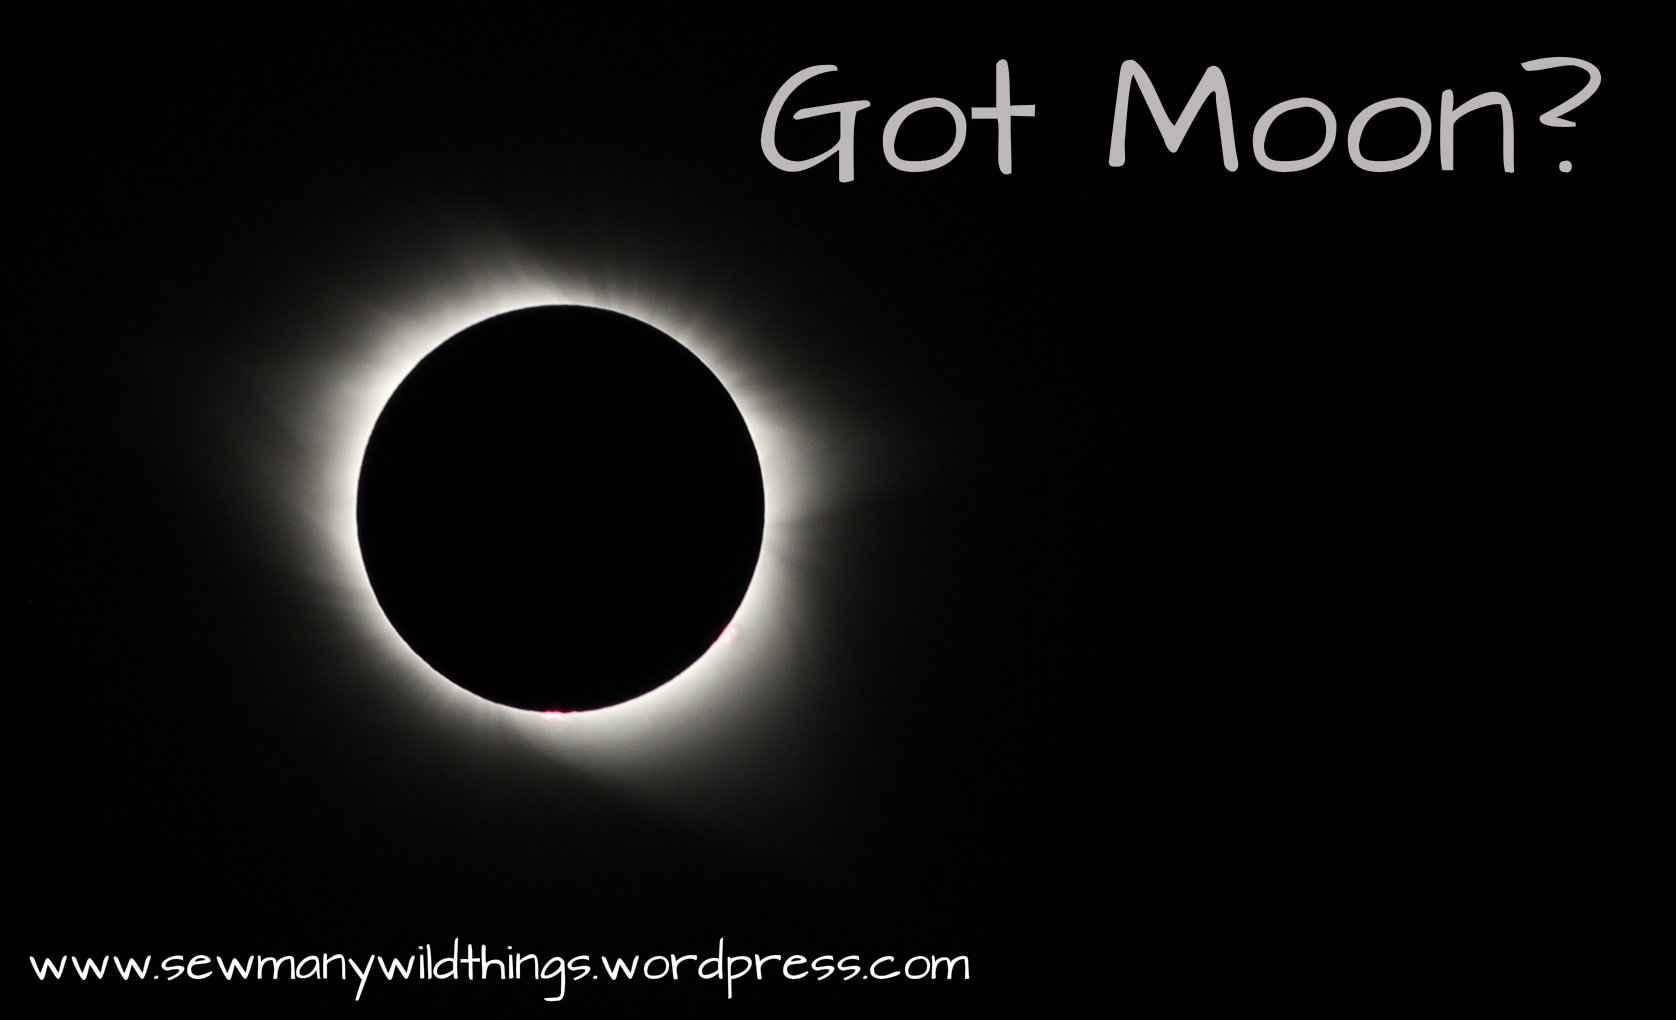 Got Moon? Eclipse Reflections